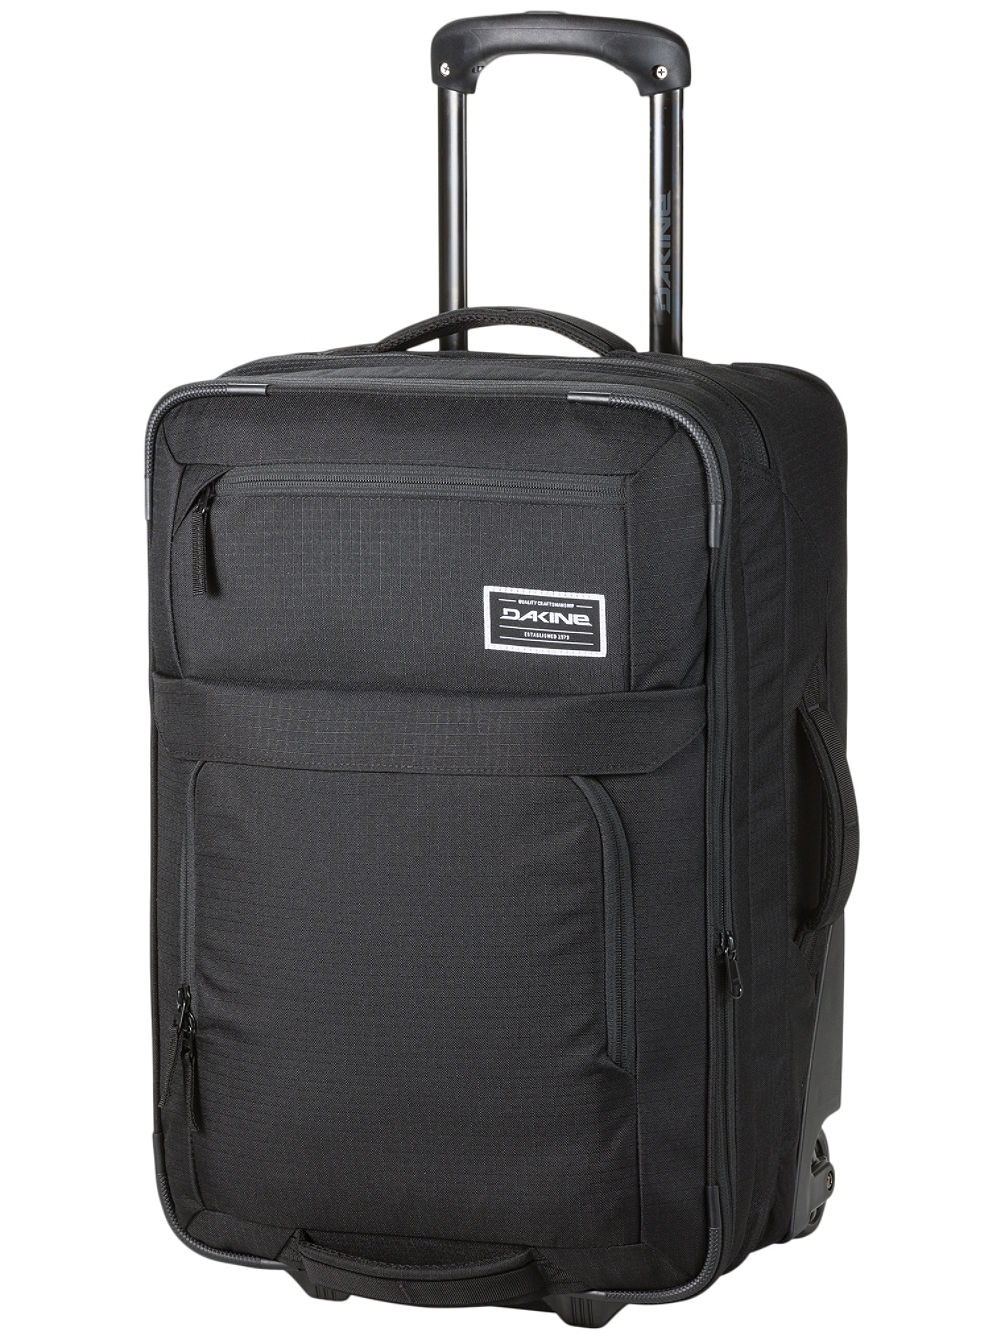 Snowboard Travel Bag Amazon